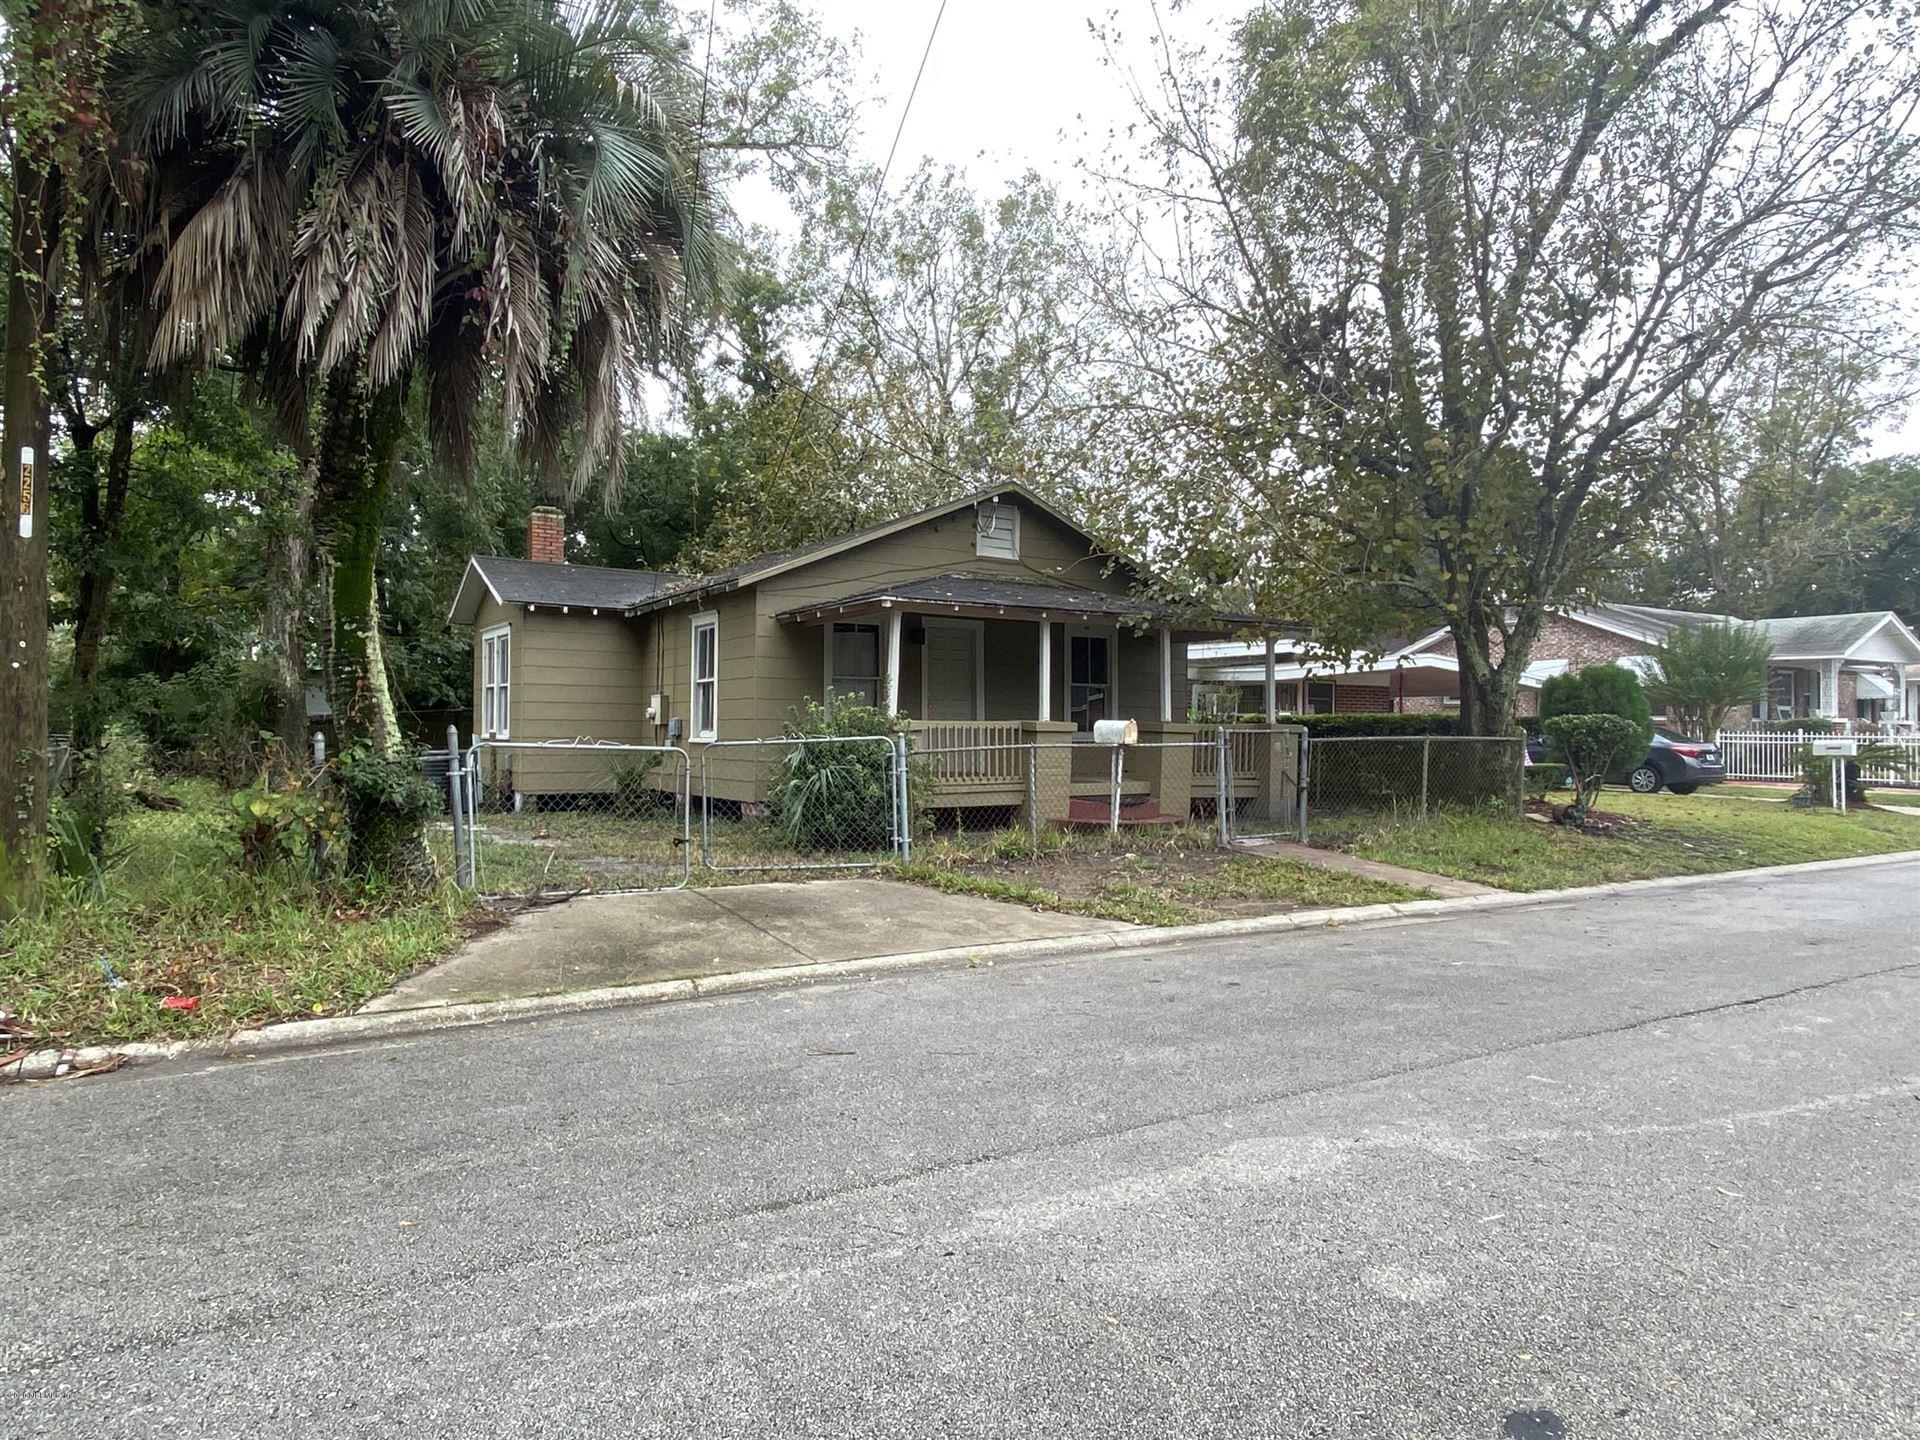 2260 W 17TH ST, Jacksonville, FL 32209 - MLS#: 1106648